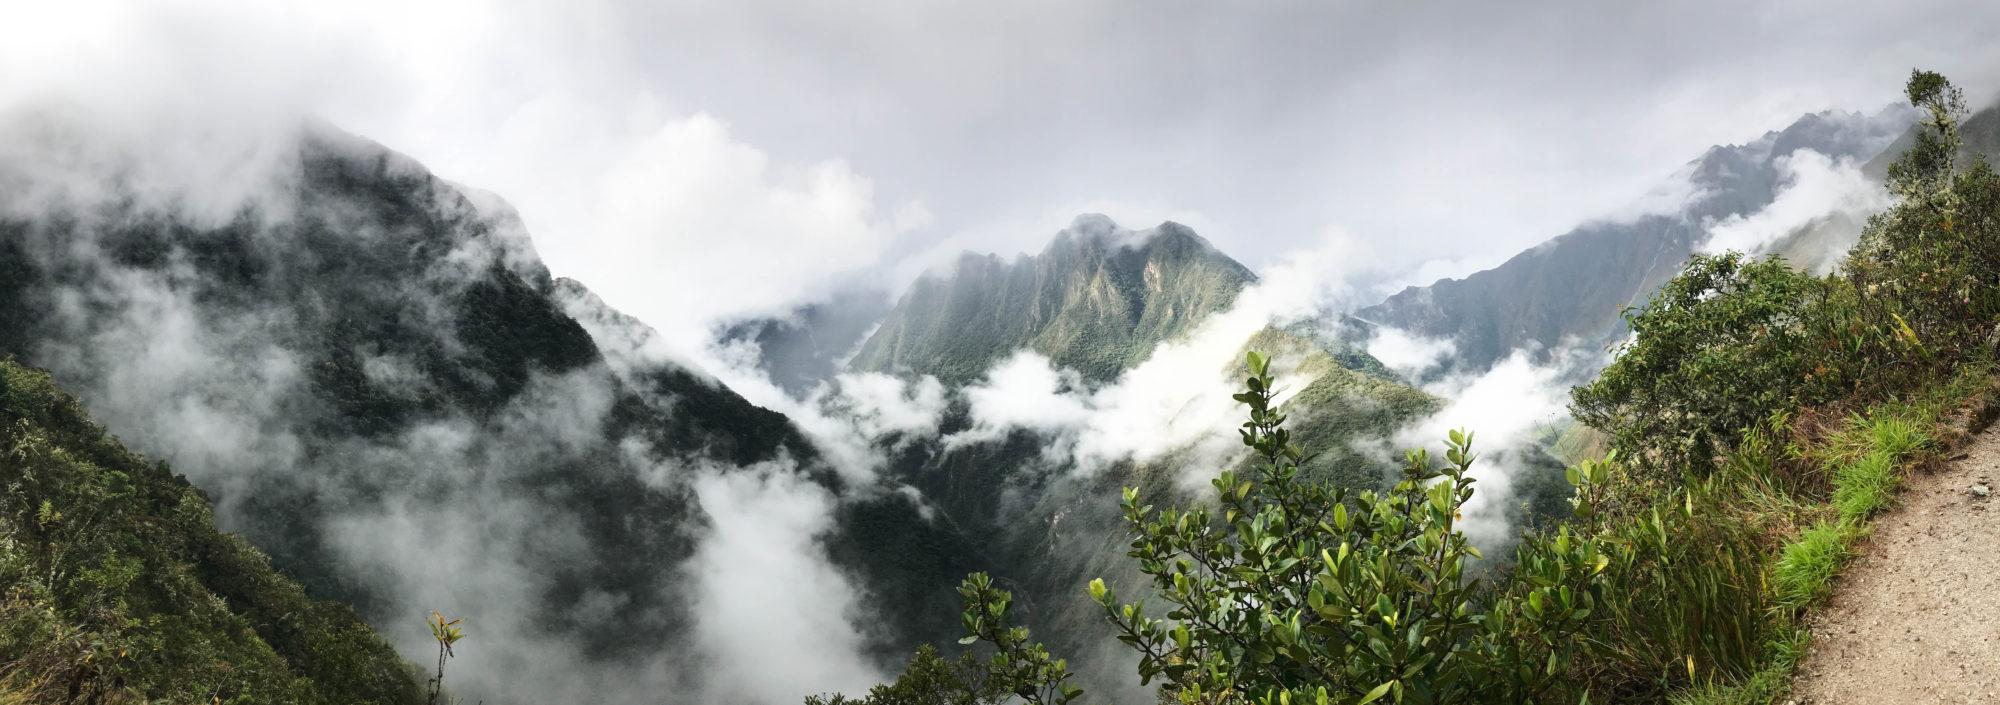 Hiking the Inca Trail to Machu Picchu   www.thatssoannie.com